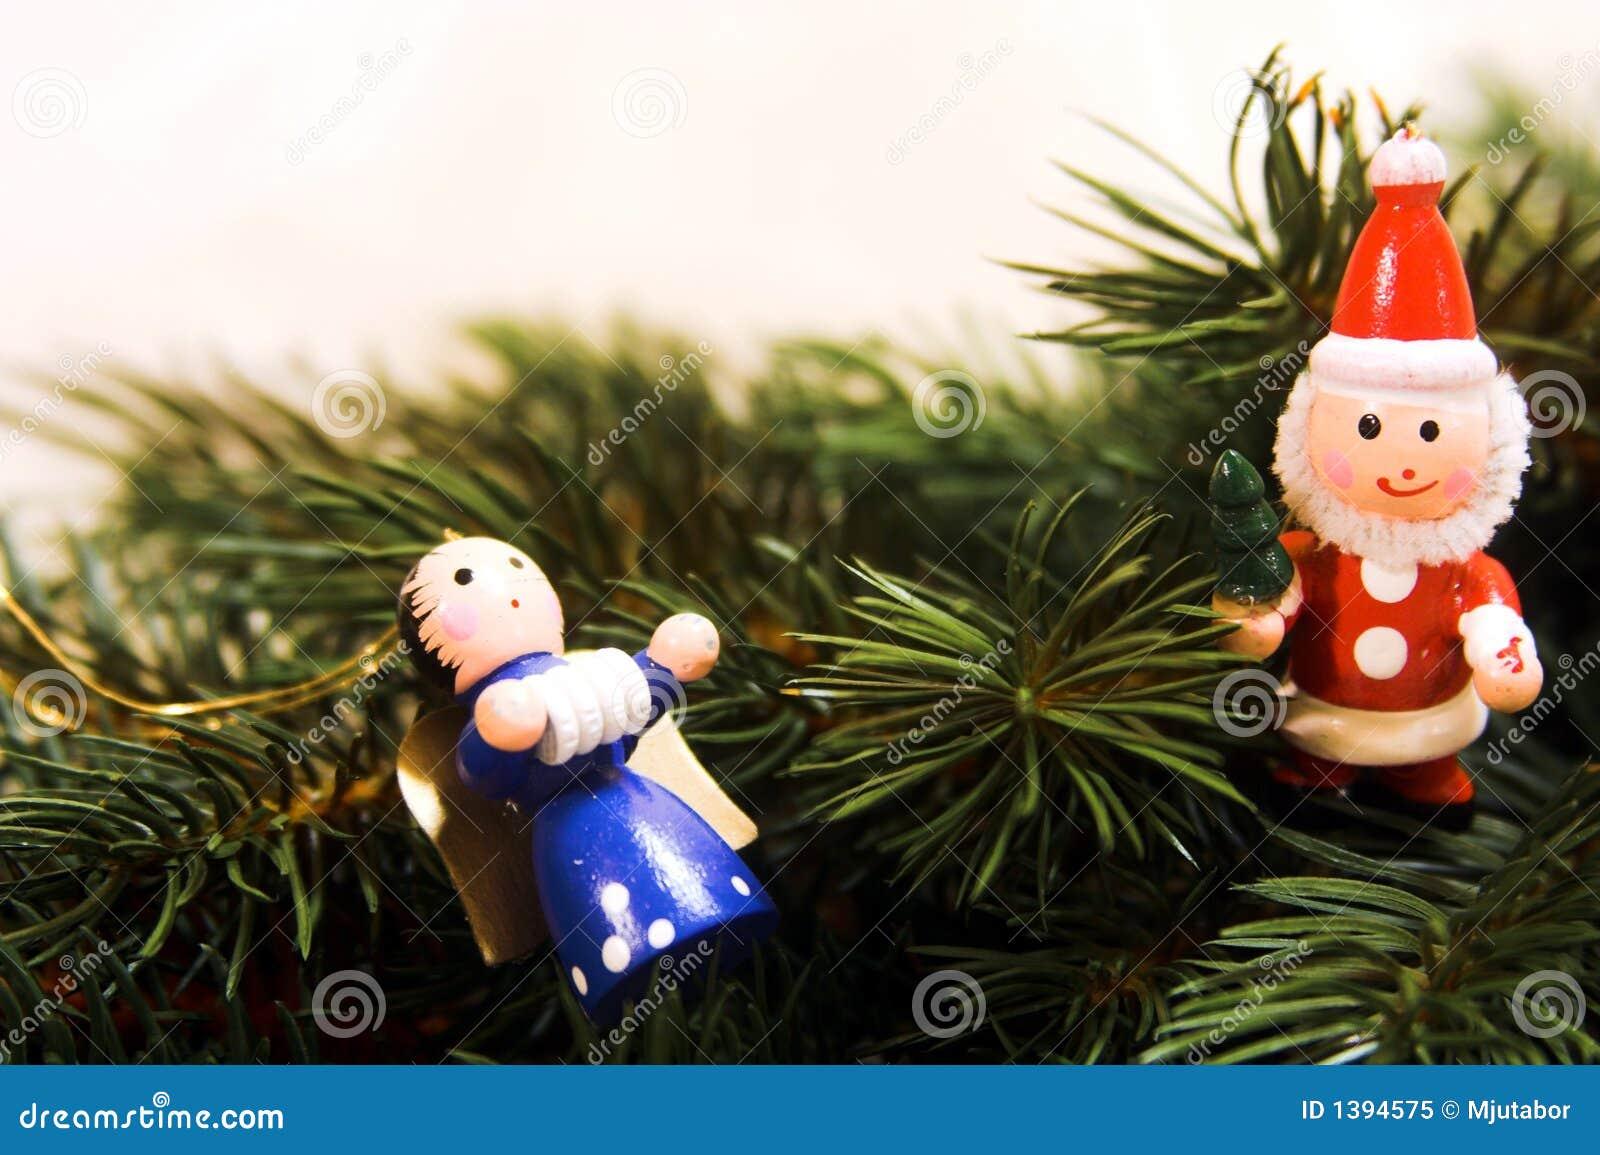 Traditional german christmas ornaments royalty free stock - Traditional german christmas tree decorations ...